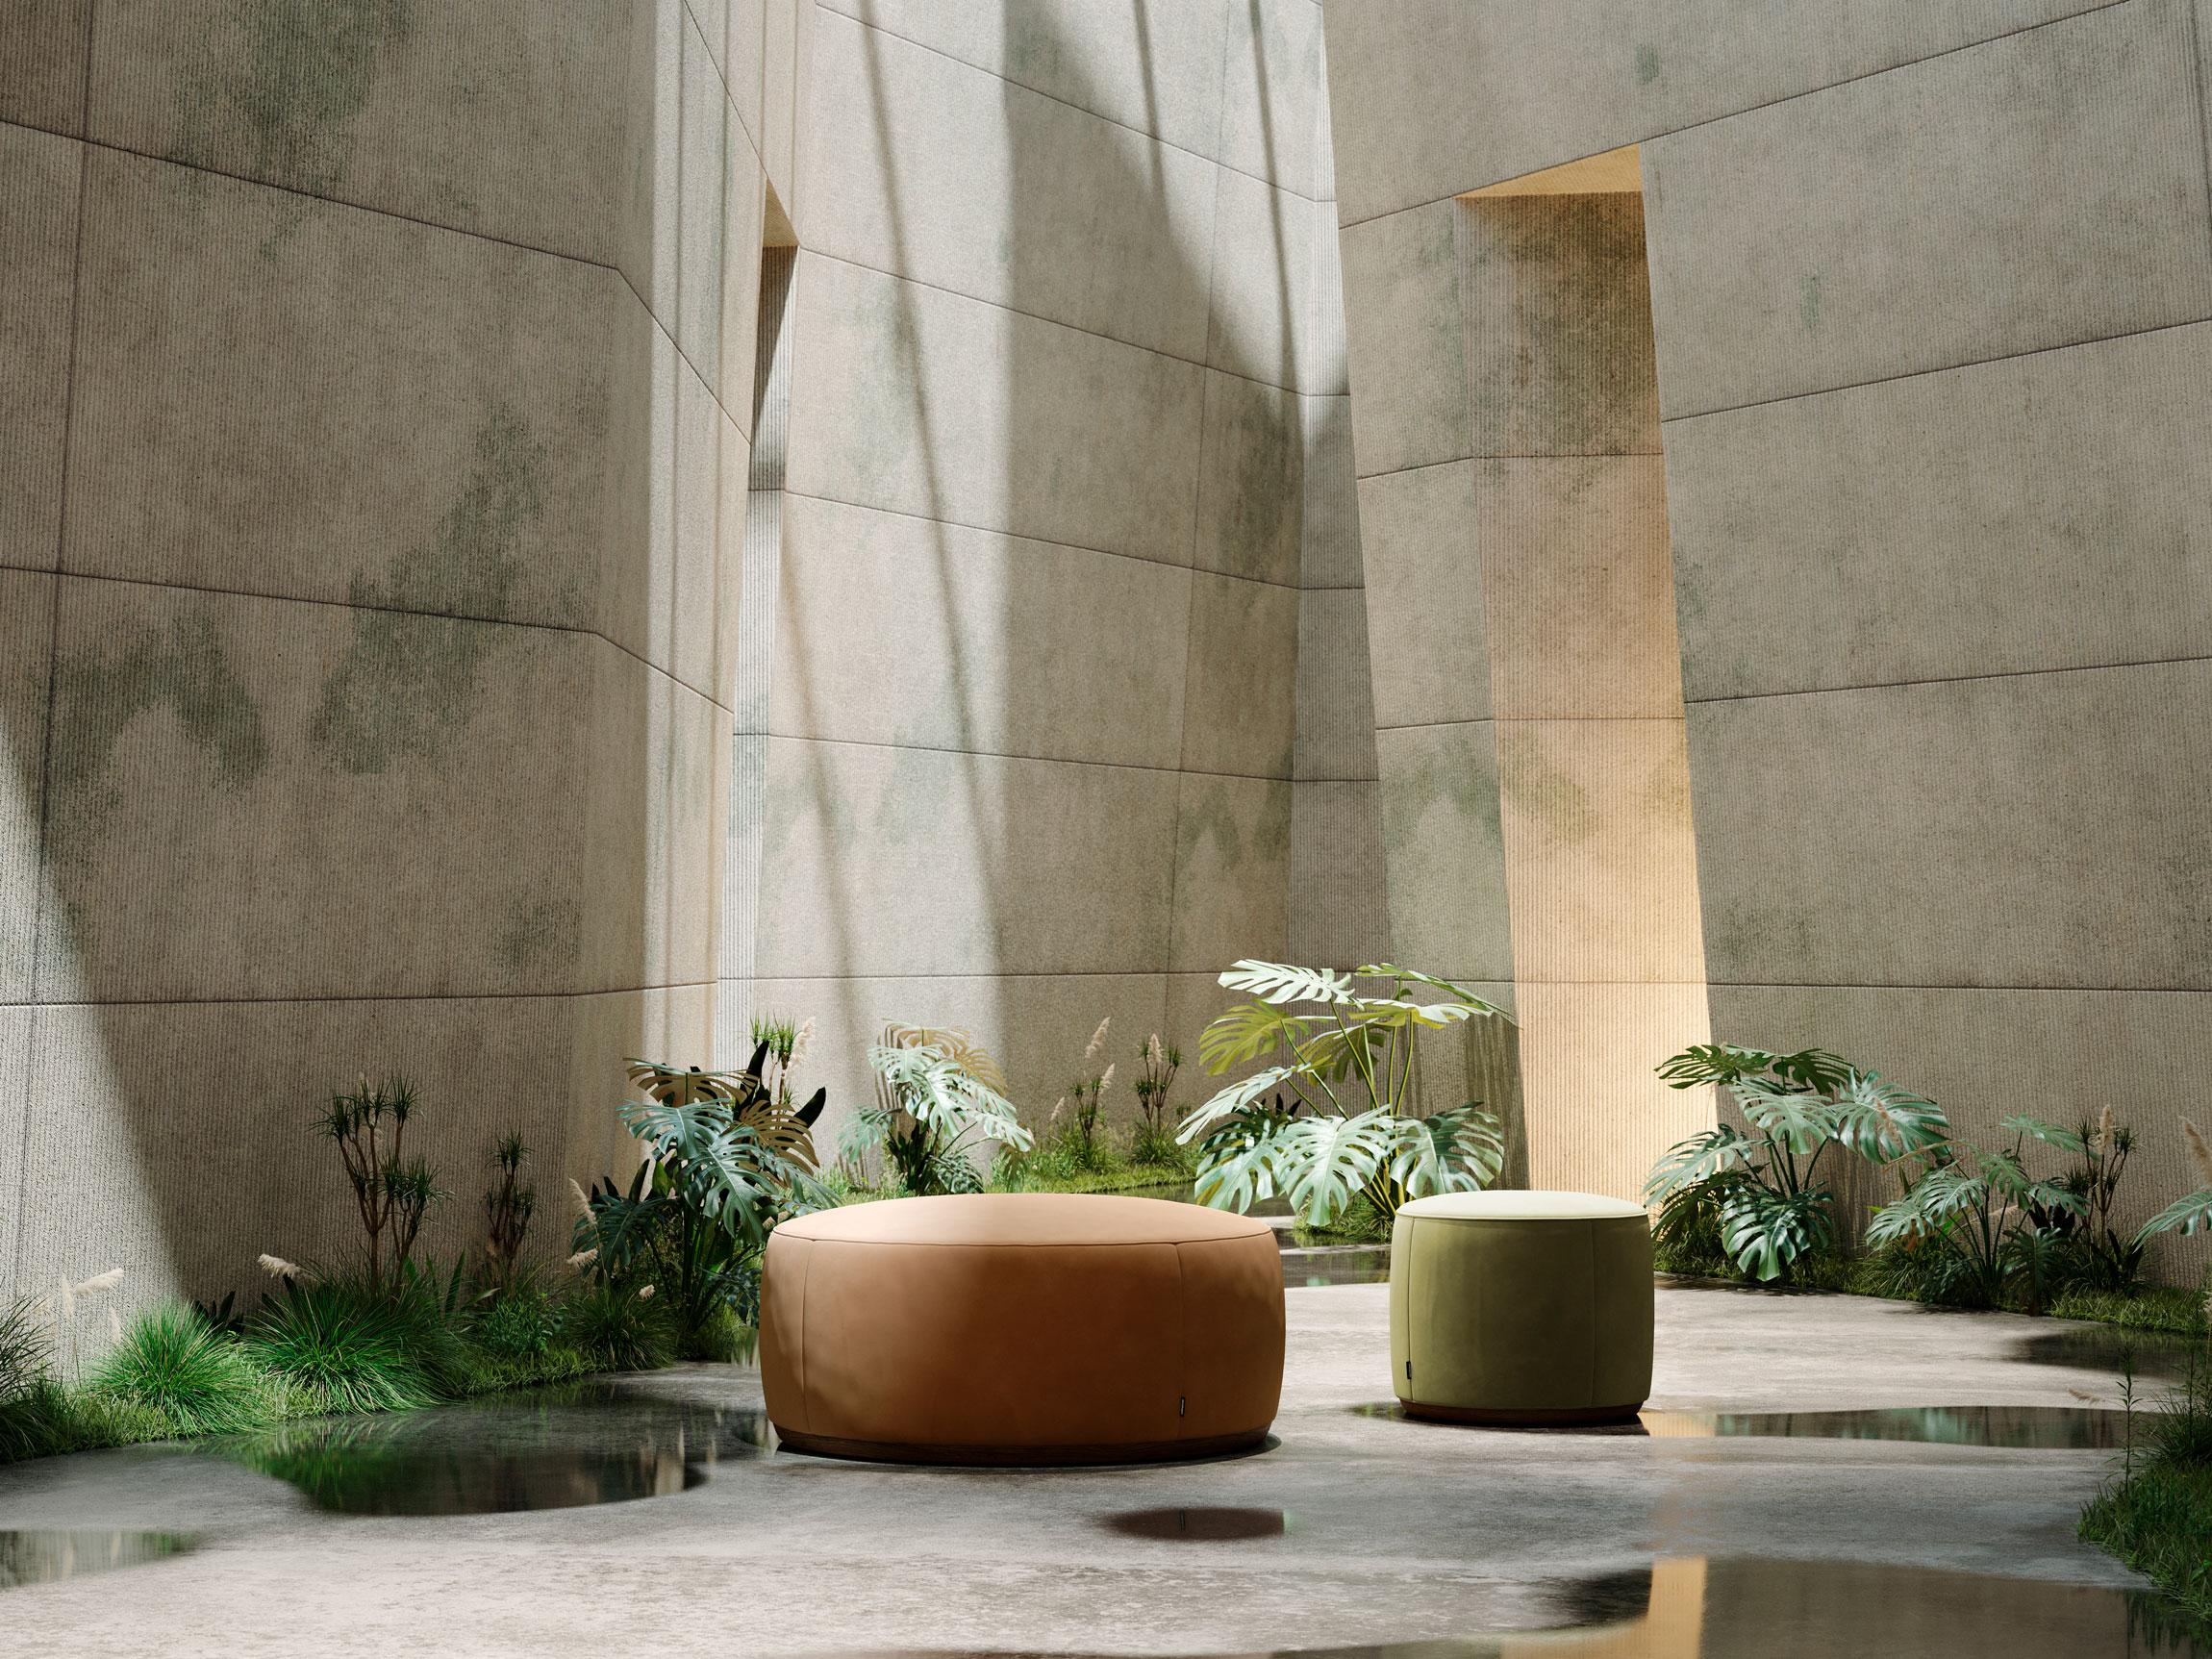 rachel-pouf-new-collection-domkapa-2021-3